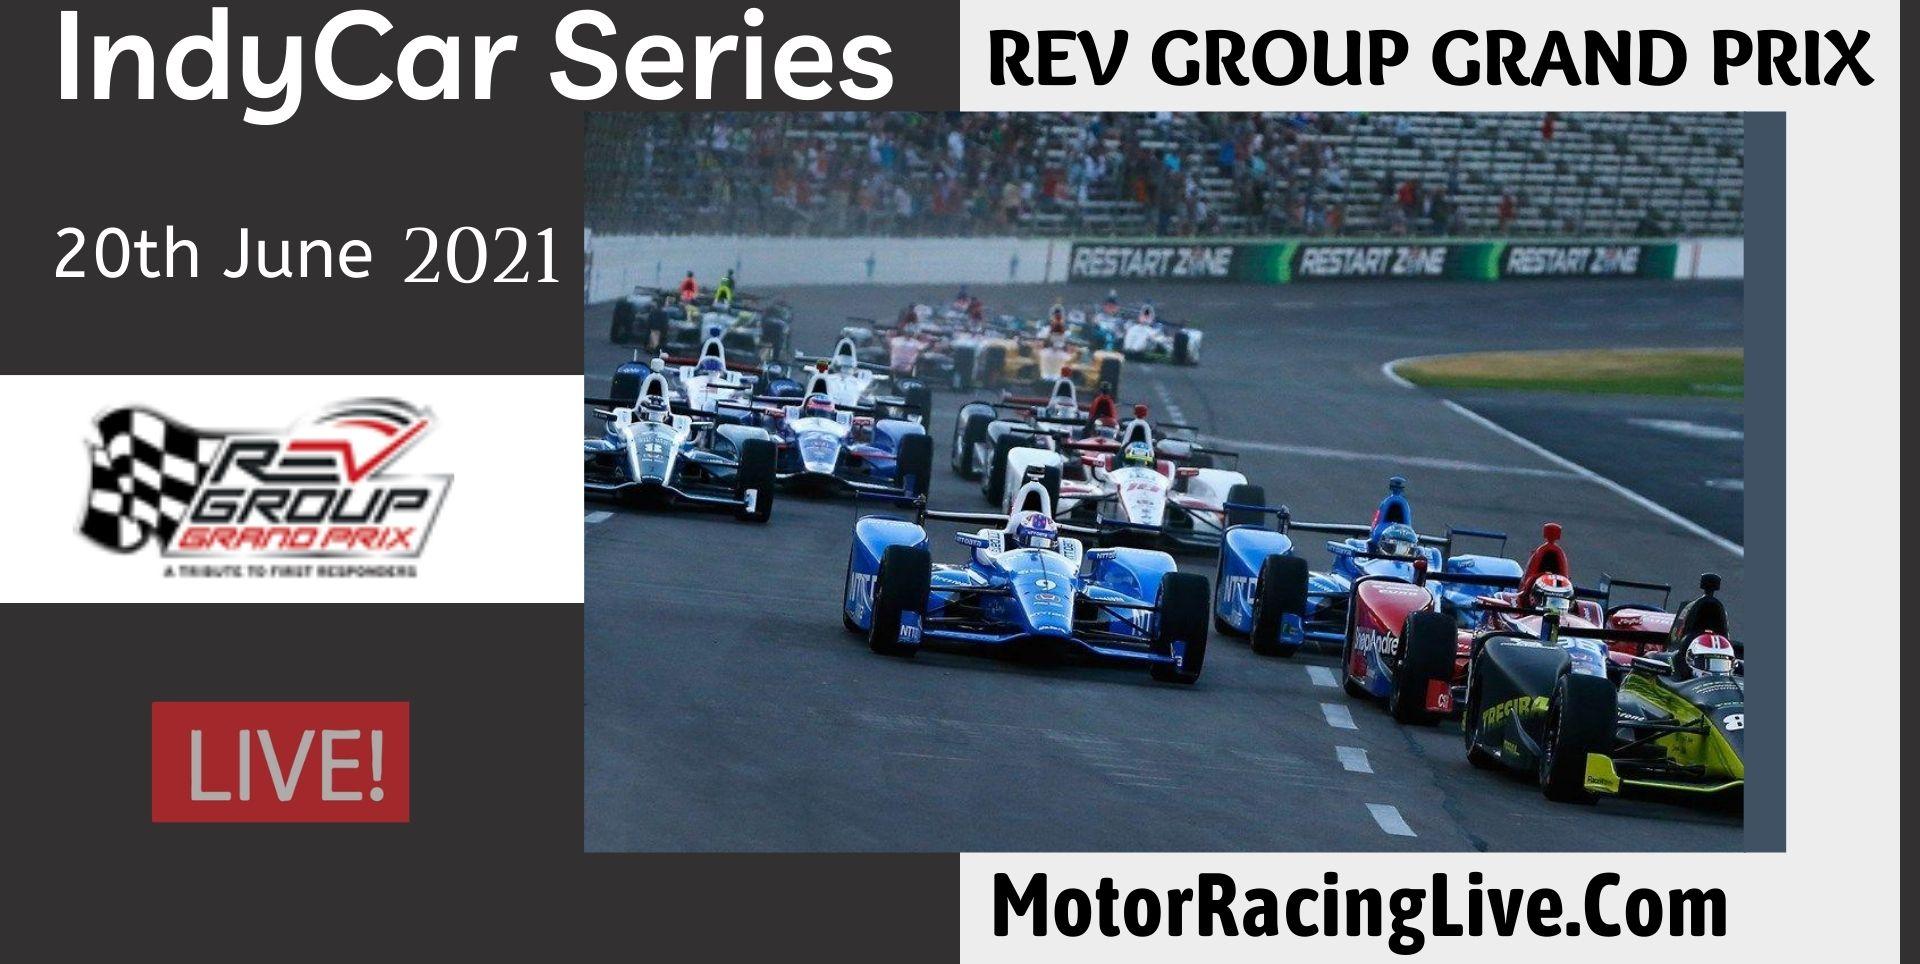 REV GROUP GRAND PRIX Live Stream 2021 | Indycar